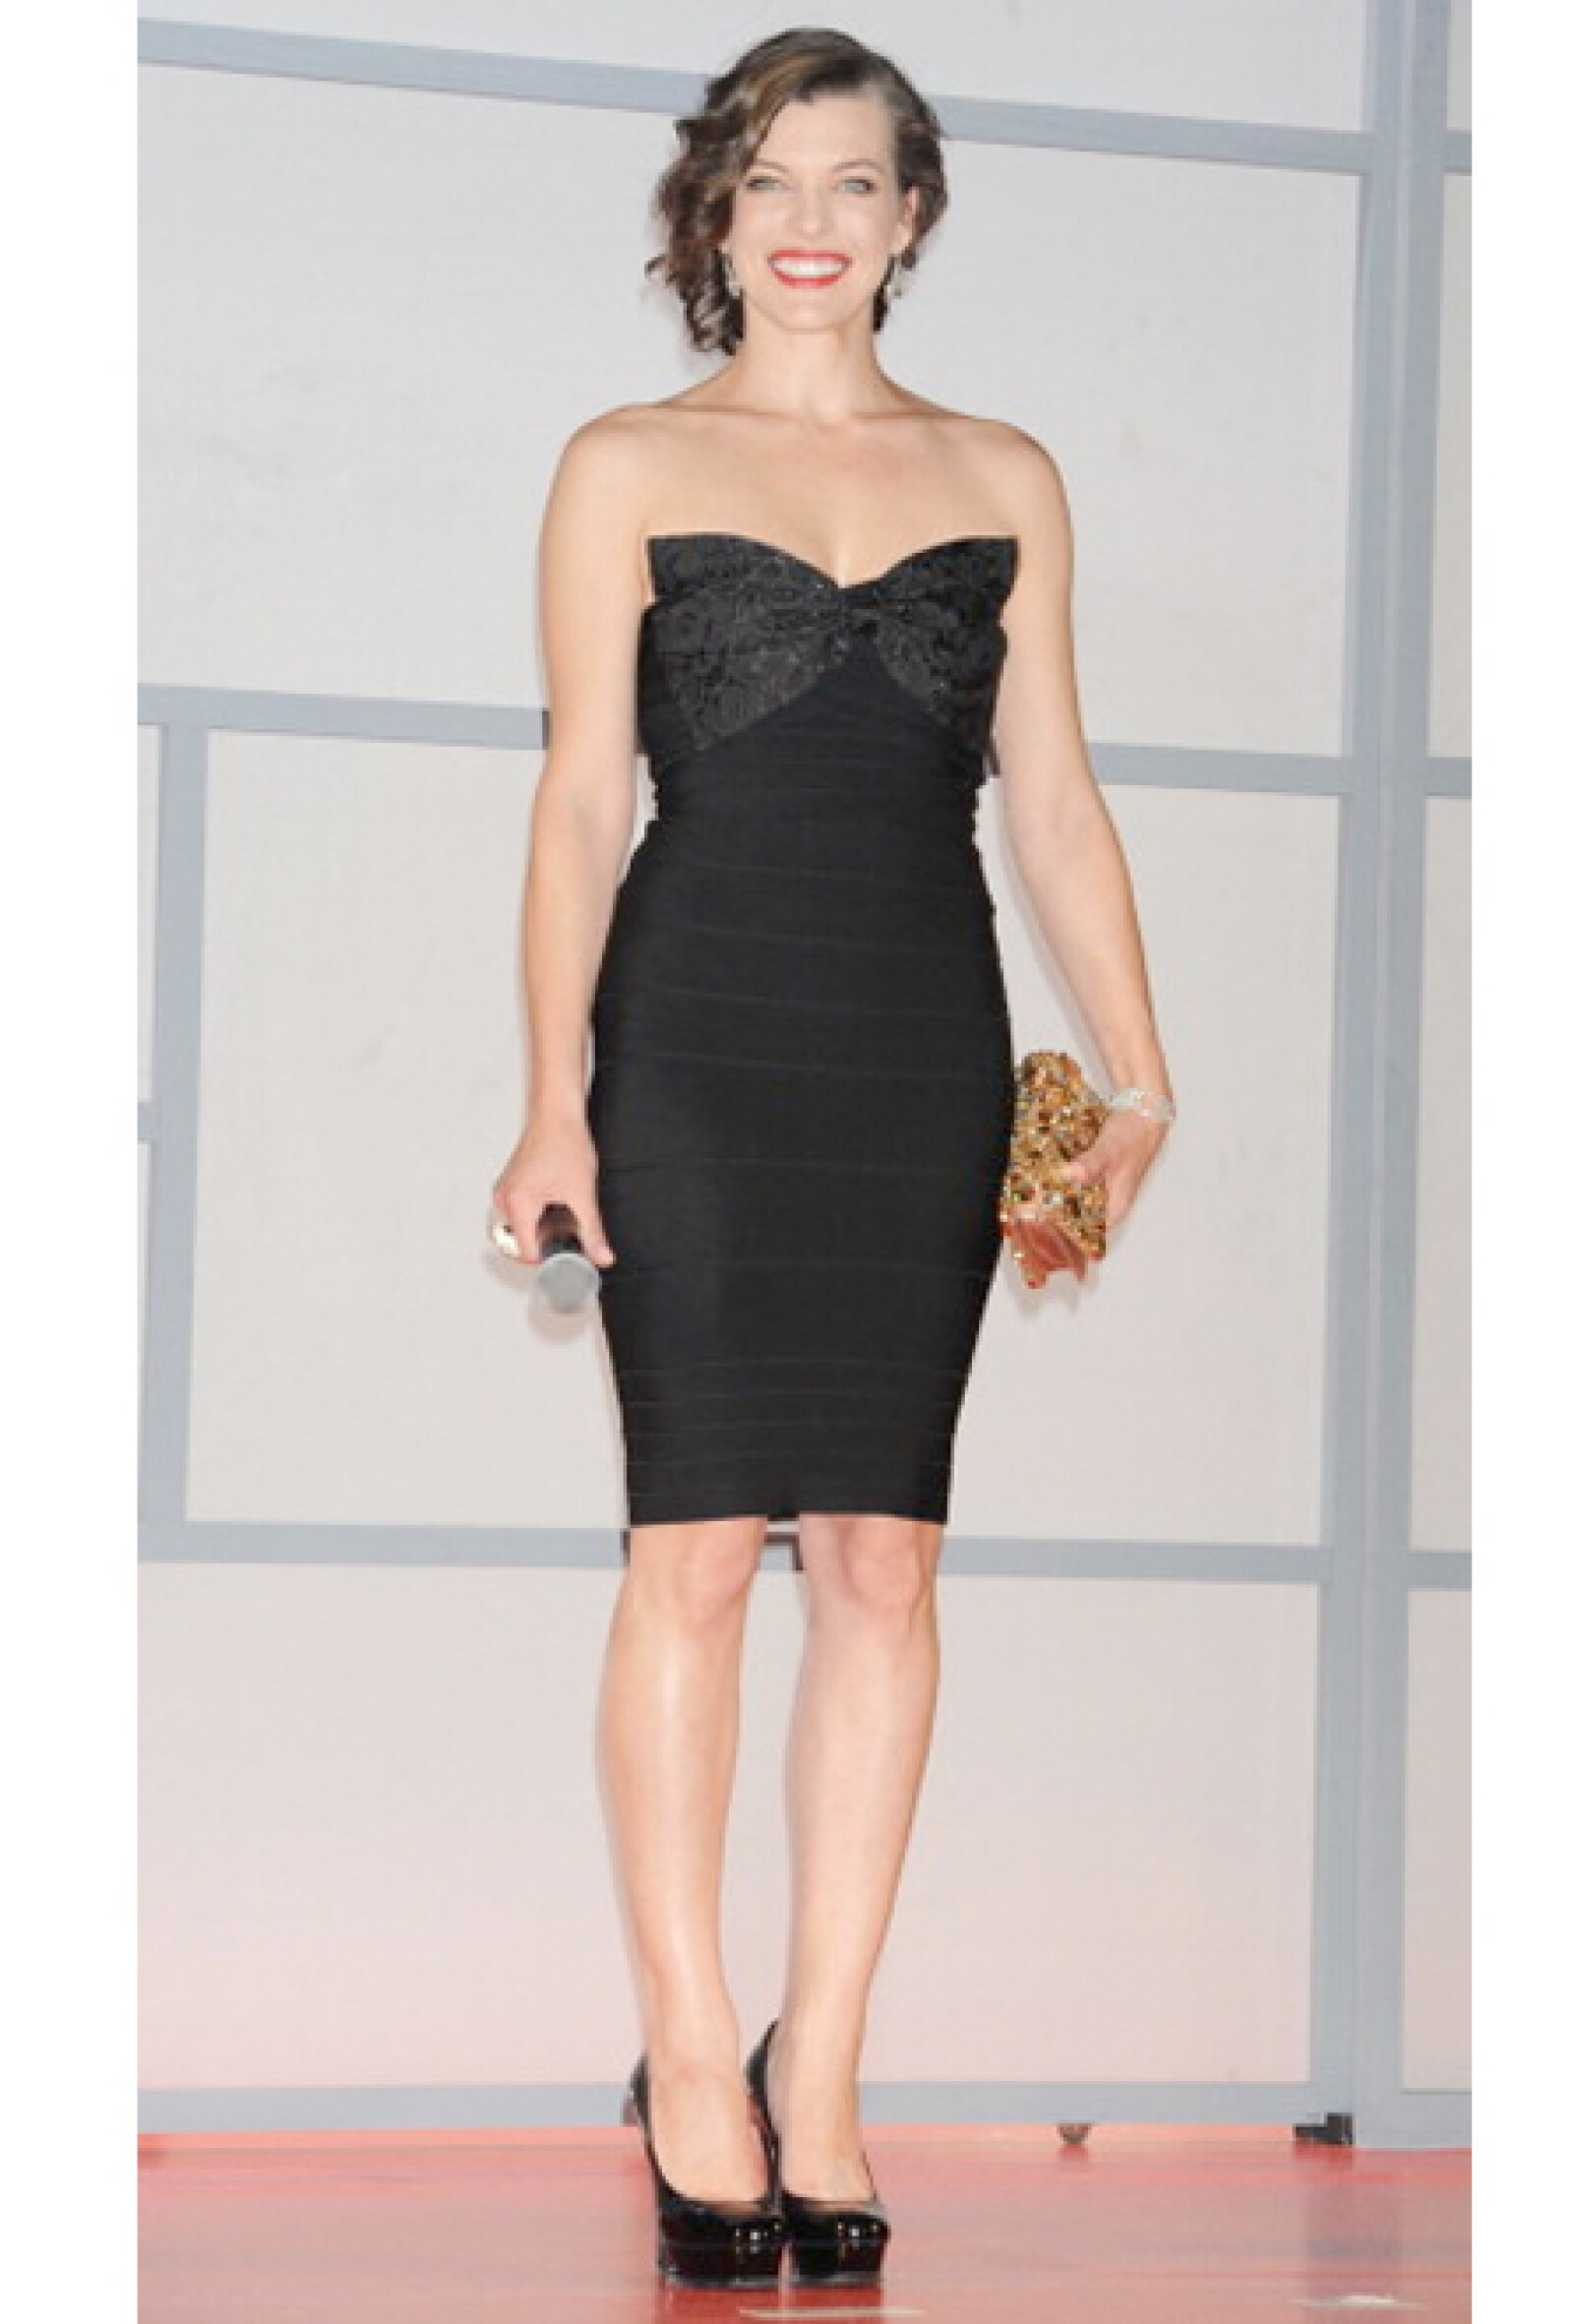 No podía faltar el clásico Little Black Dress. Éste es de Hervé Léger.